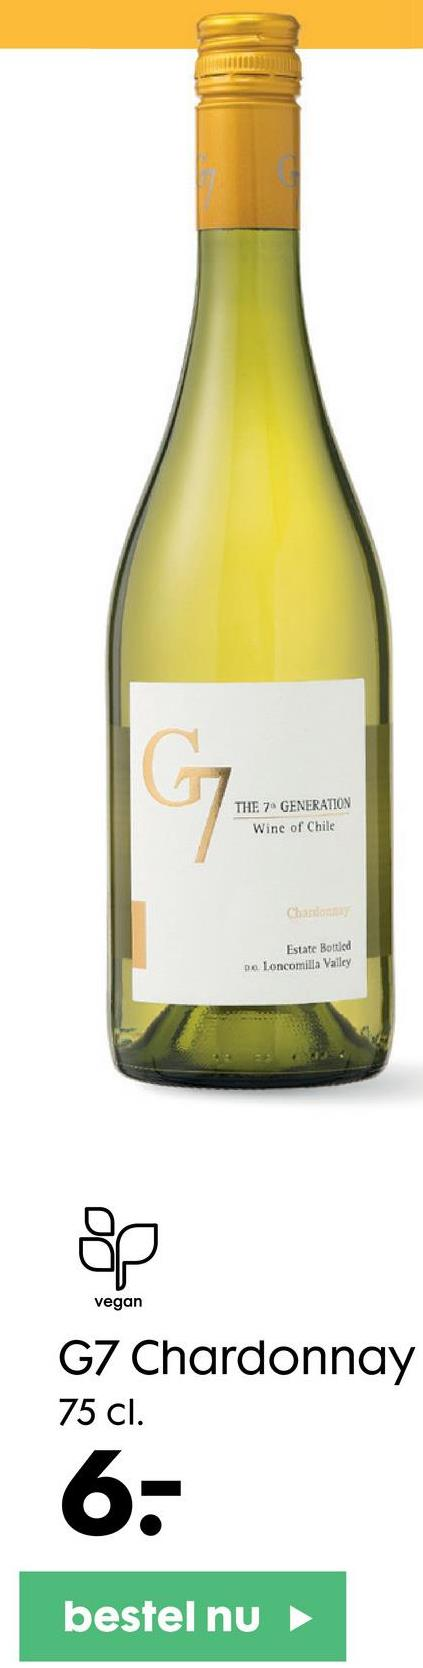 G THE 7. GENERATION Wine of Chile Charlotte Estate Bottled De Loncomilla Valley op vegan G7 Chardonnay 75 cl. 6- bestel nu